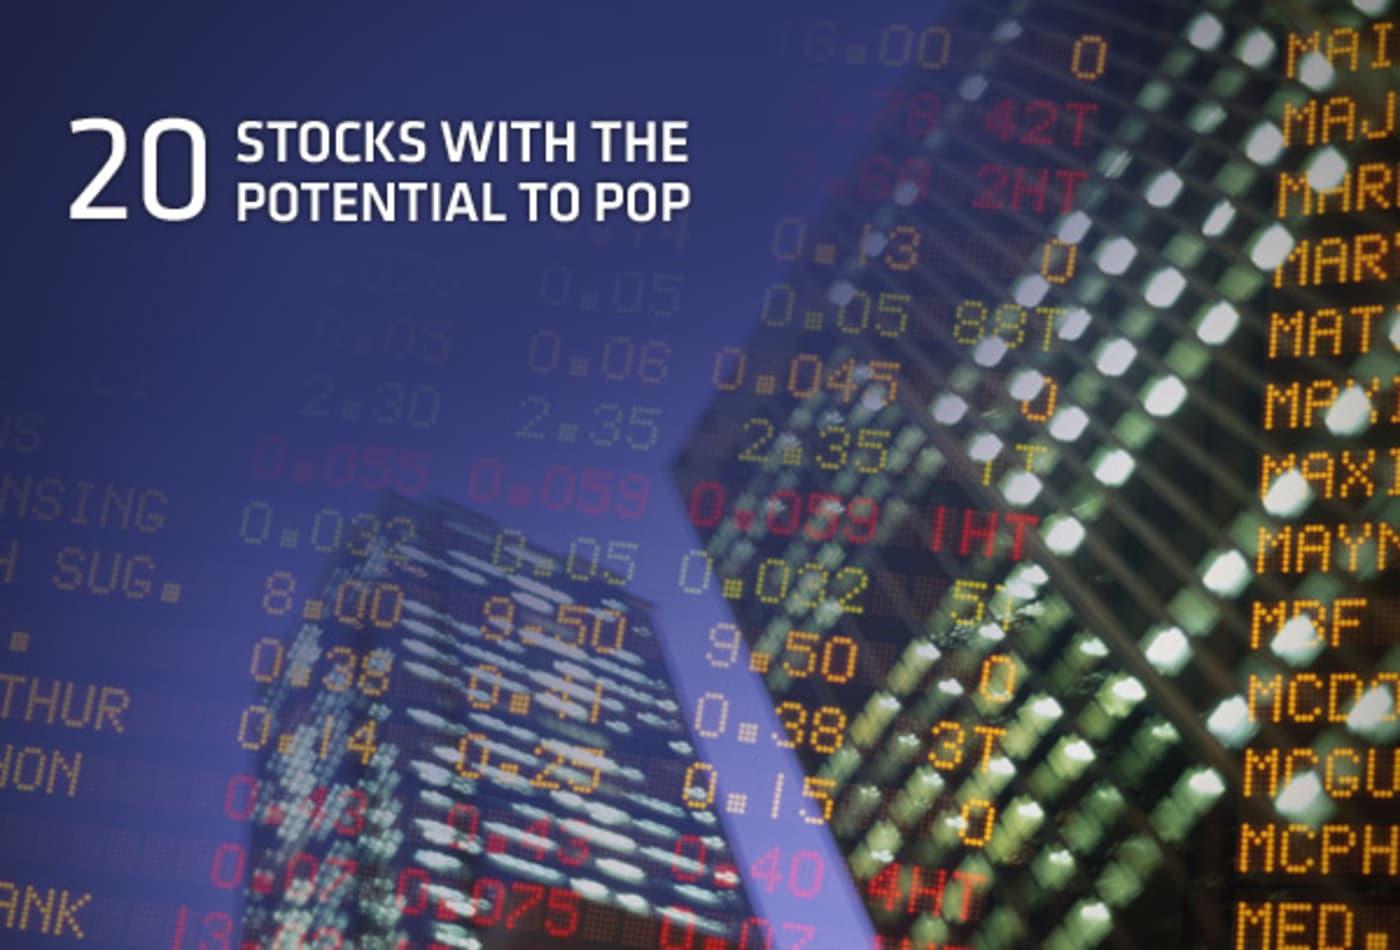 45755742 CNBC_20_stocks_to_pop_0511_COVER.jpg